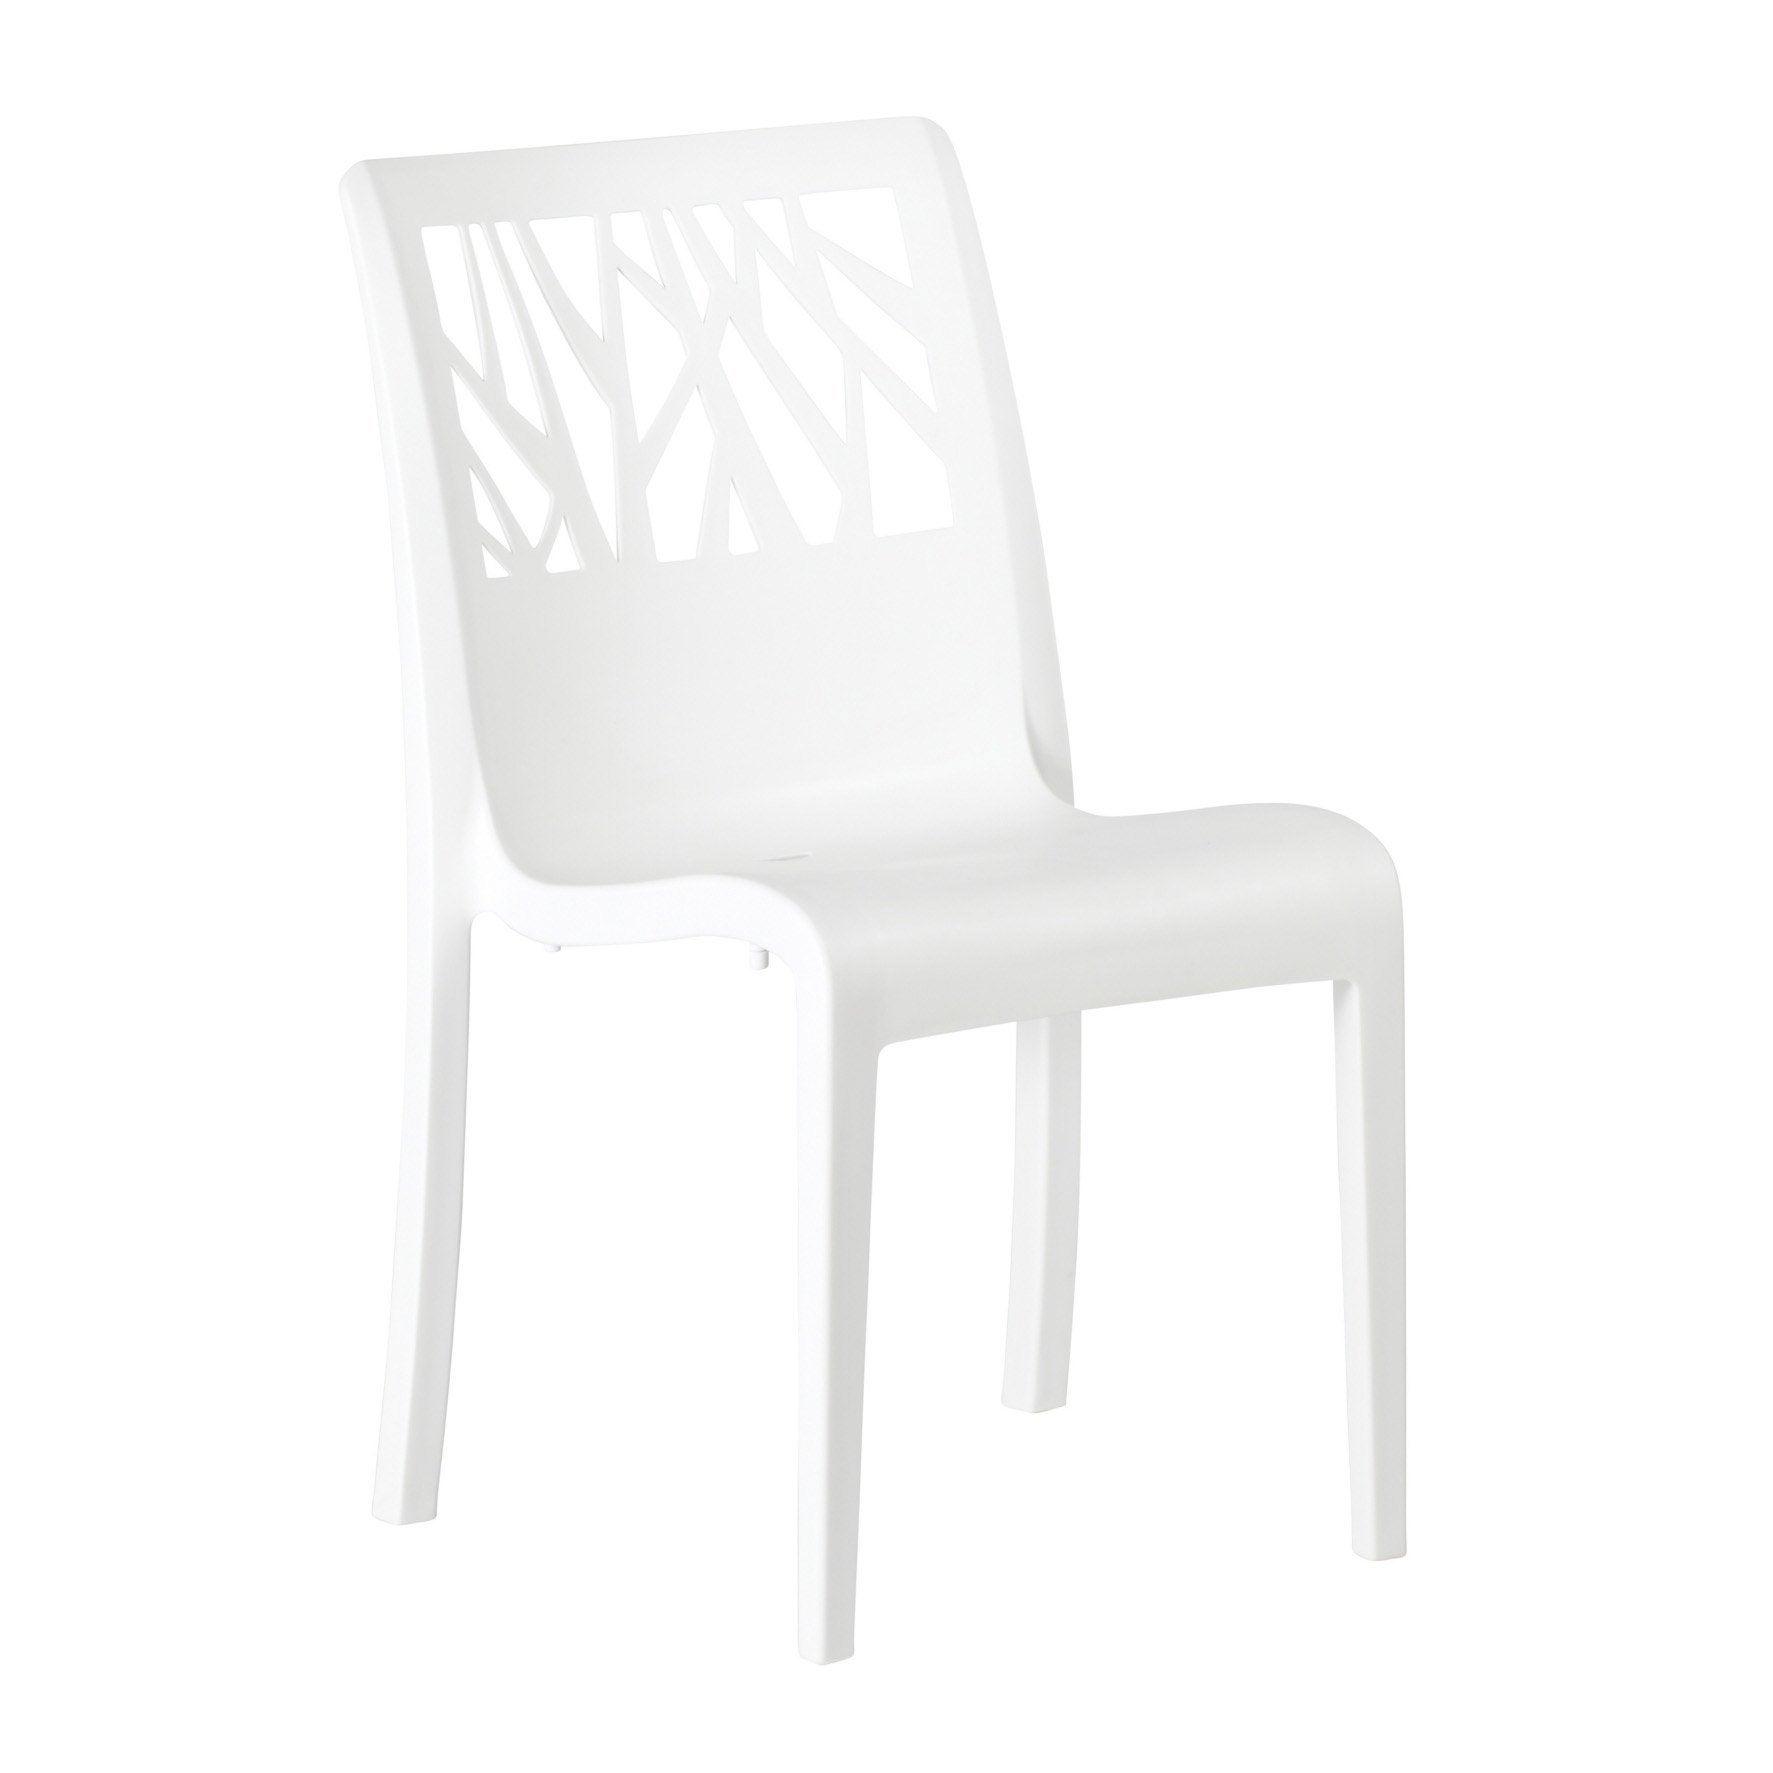 chaise terrasse design plastique leroy merlin